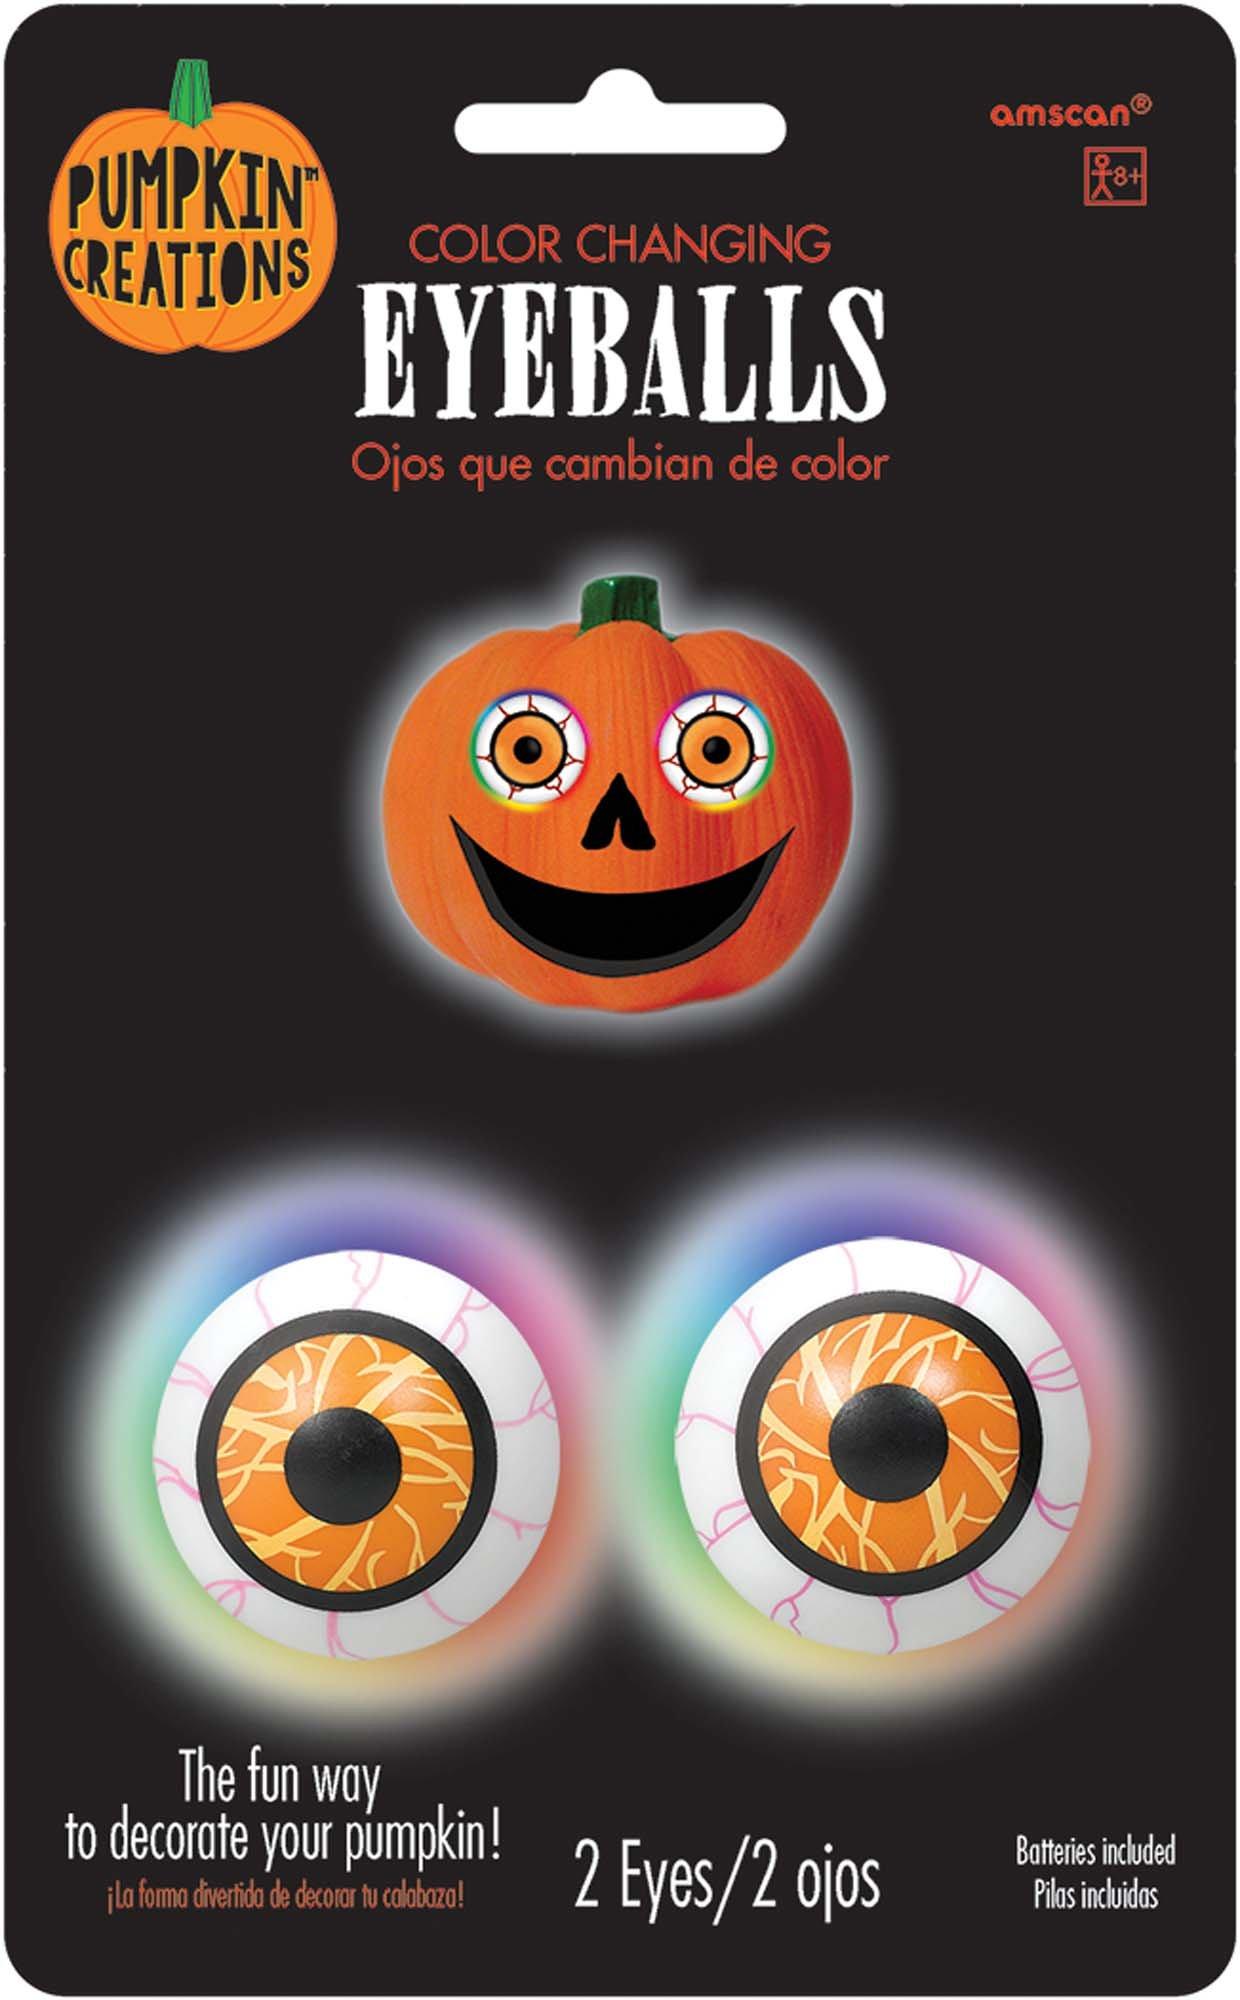 Color Changing Pumpkin Eyeballs Light by amscan